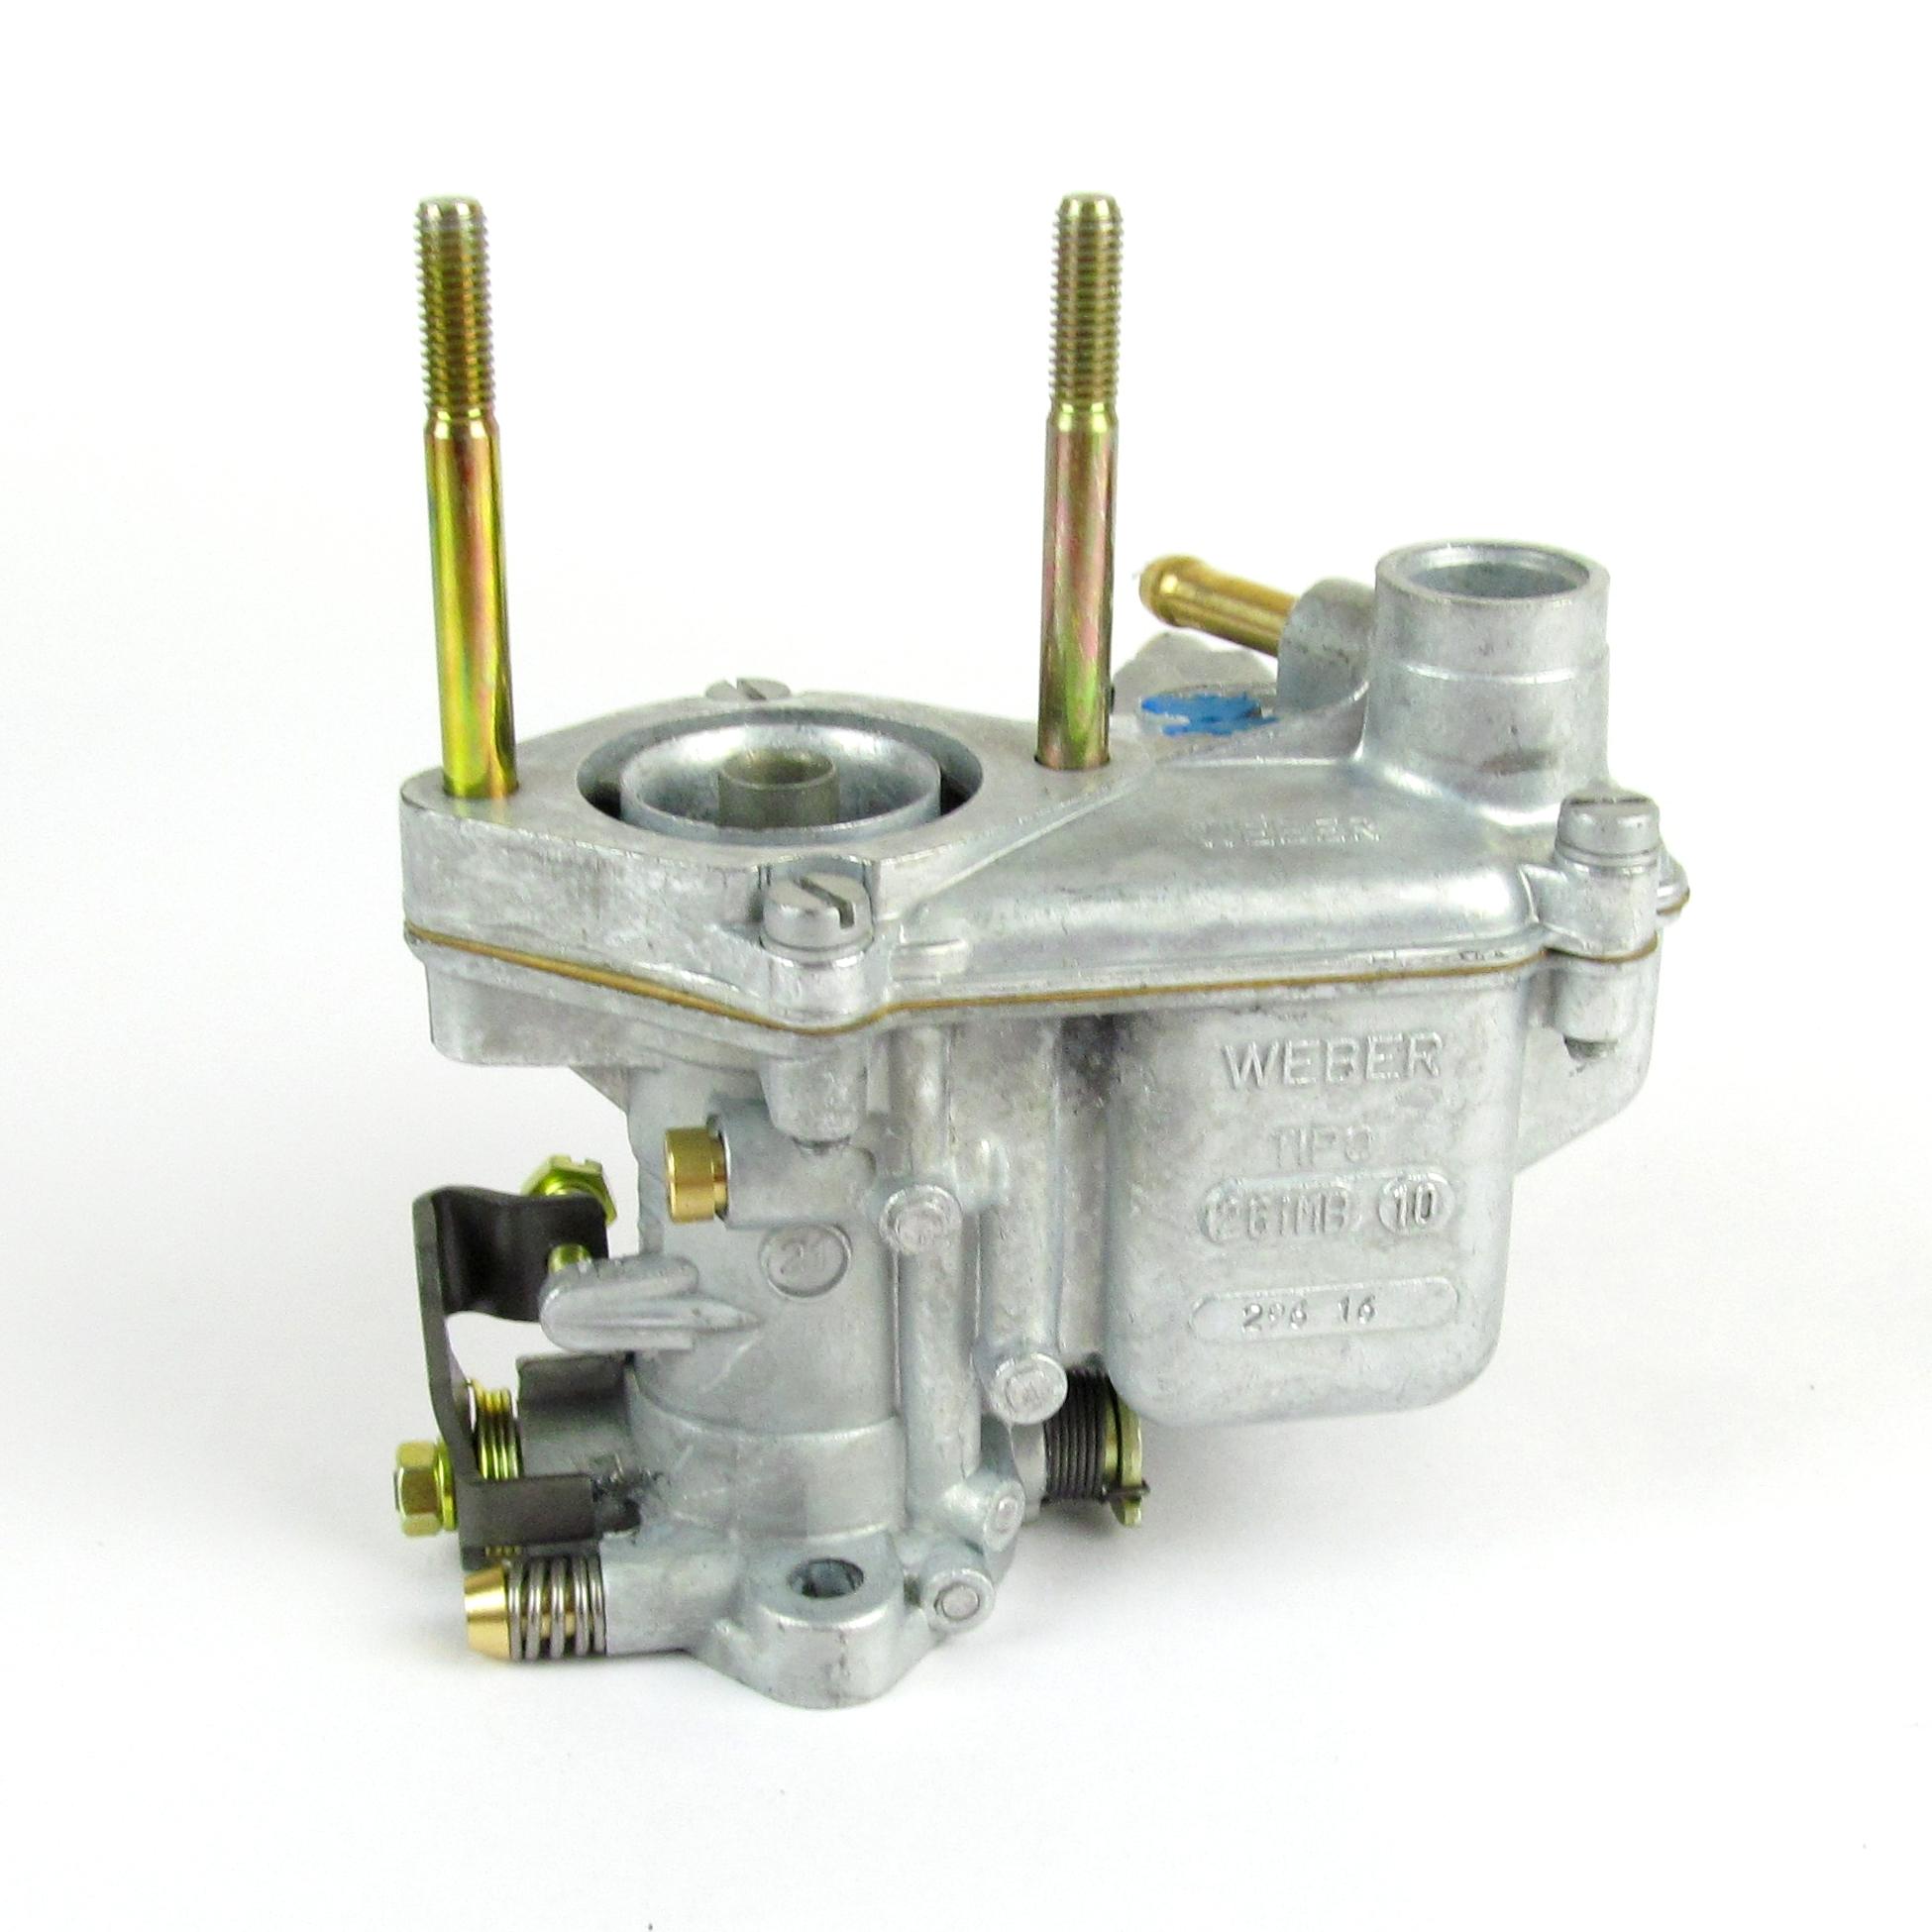 Weber 28 Imb Carburettor Carb For Classic Fiat 126 652cc Classic Carbs Uk